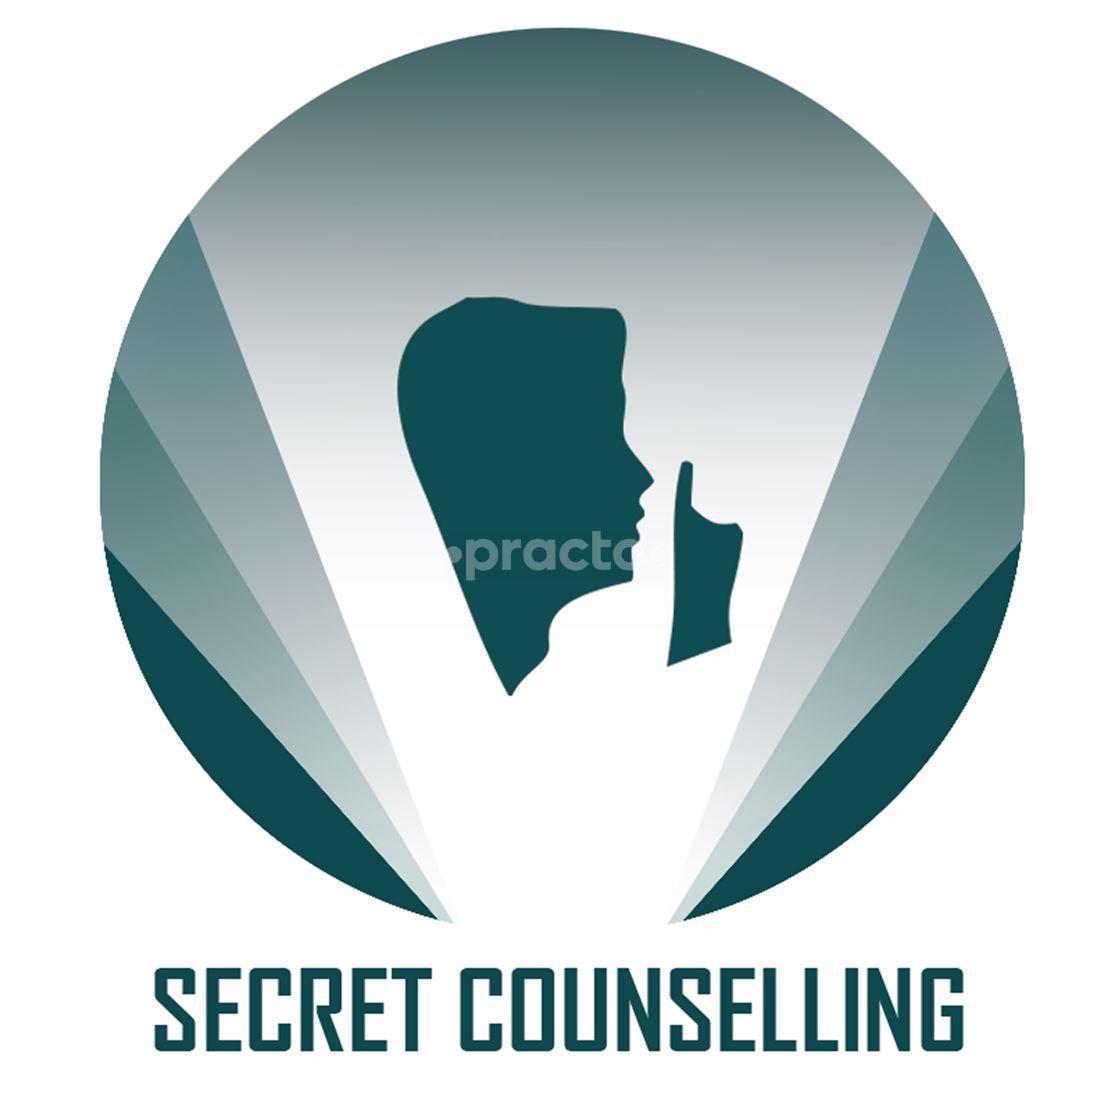 Secret Counselling